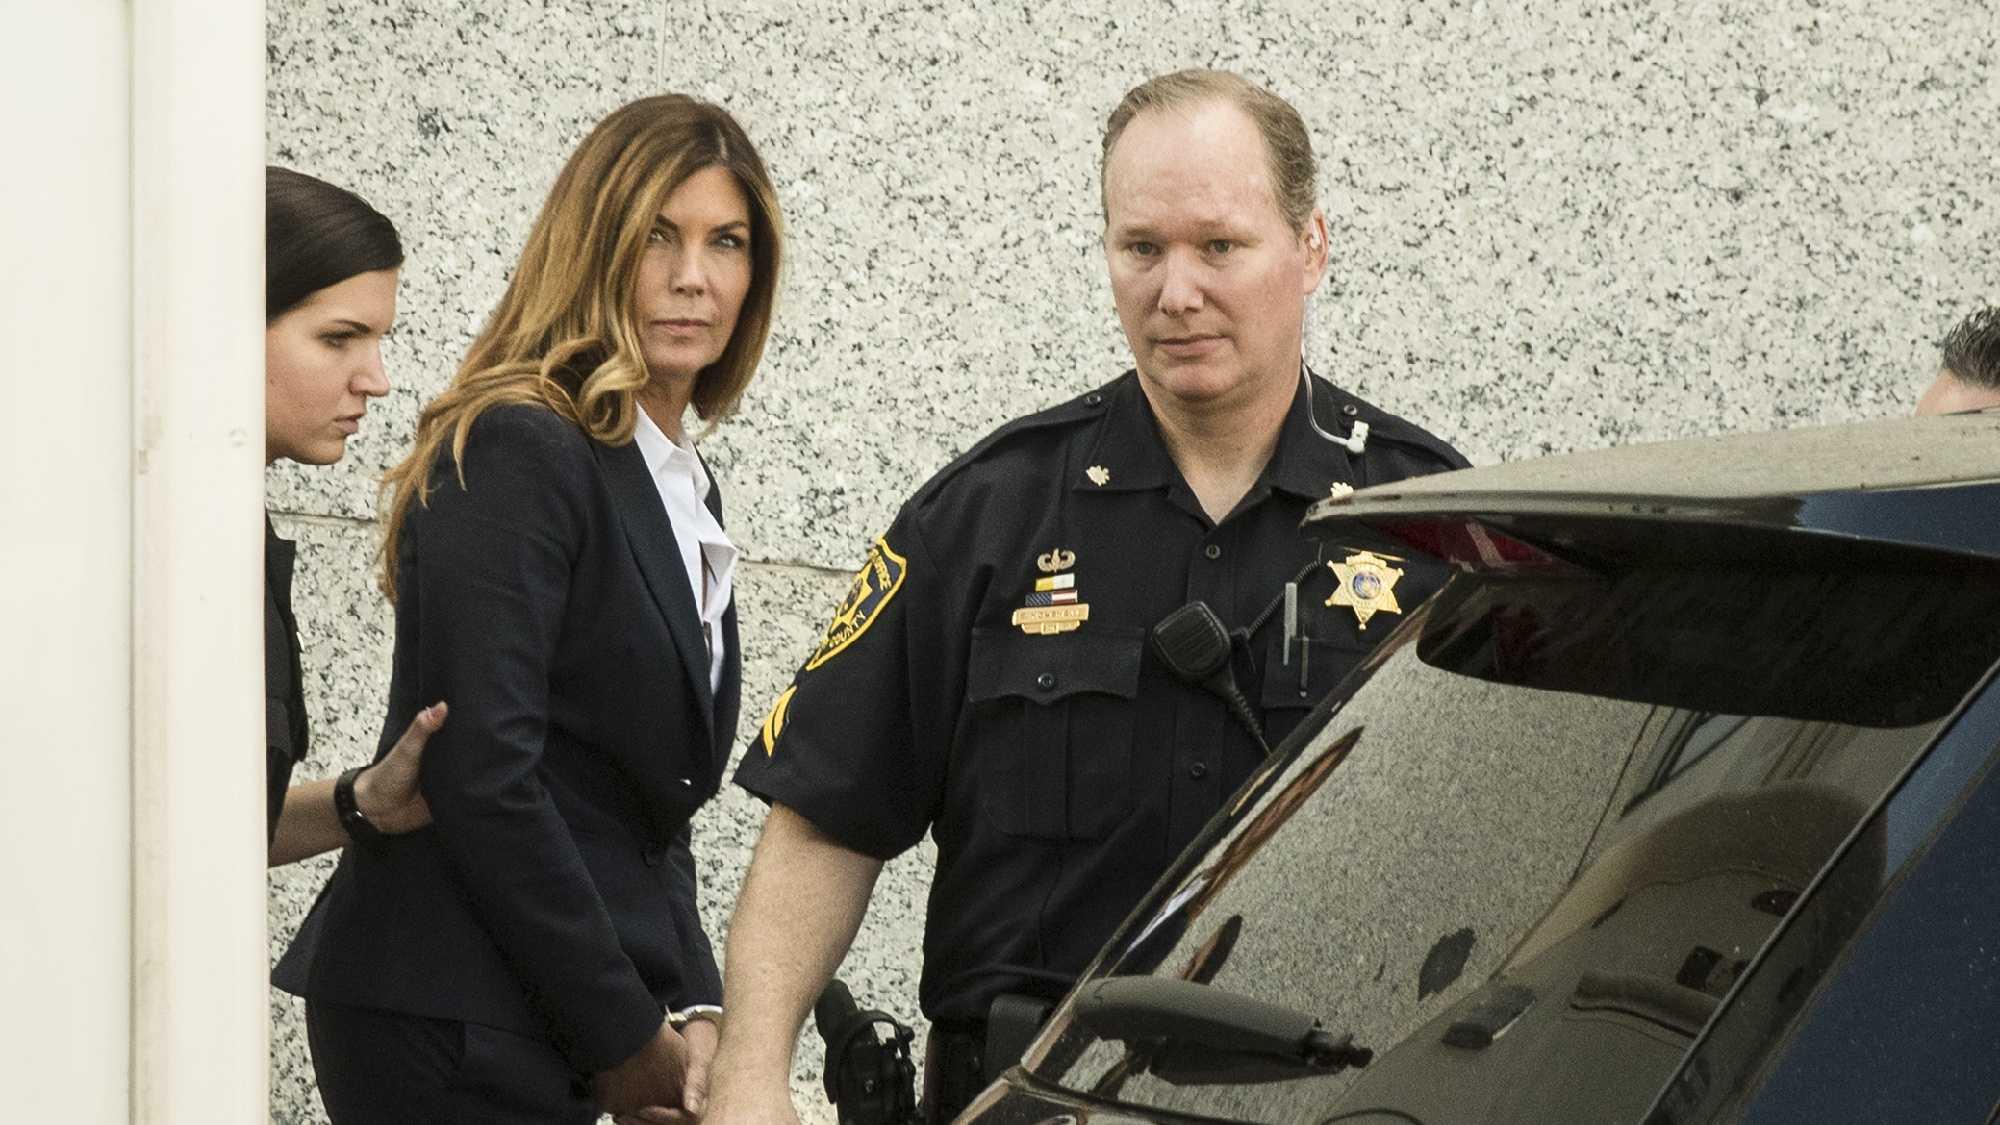 Kathleen Kane handcuffs AP